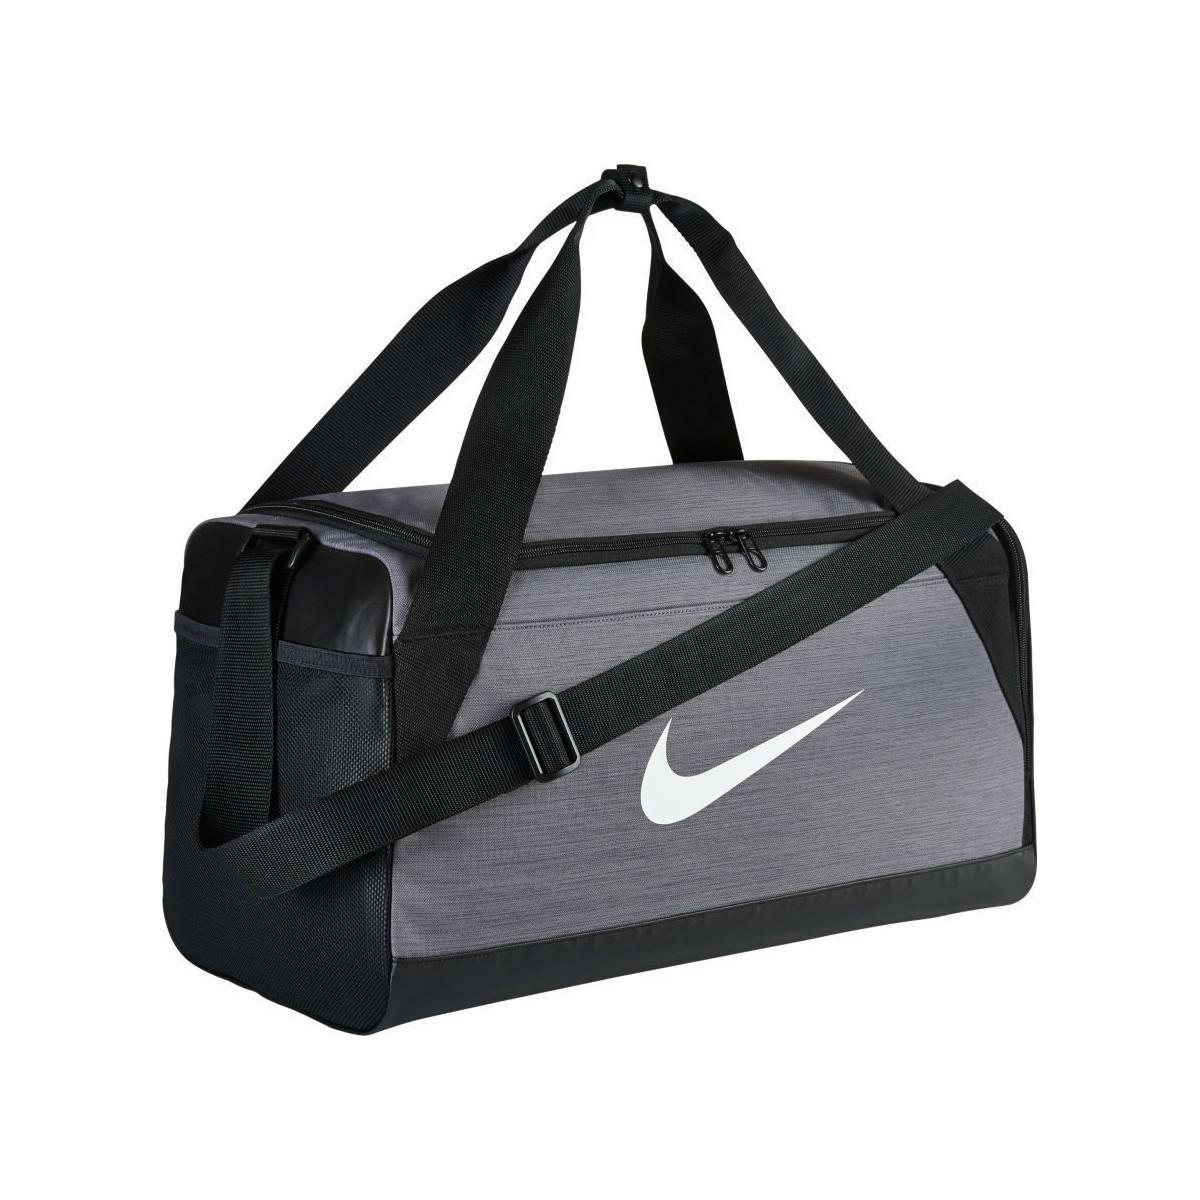 58ac7597fa Nike Ba5335 Brasilia (small) Training Duffel Bag Women s Sports Bag ...